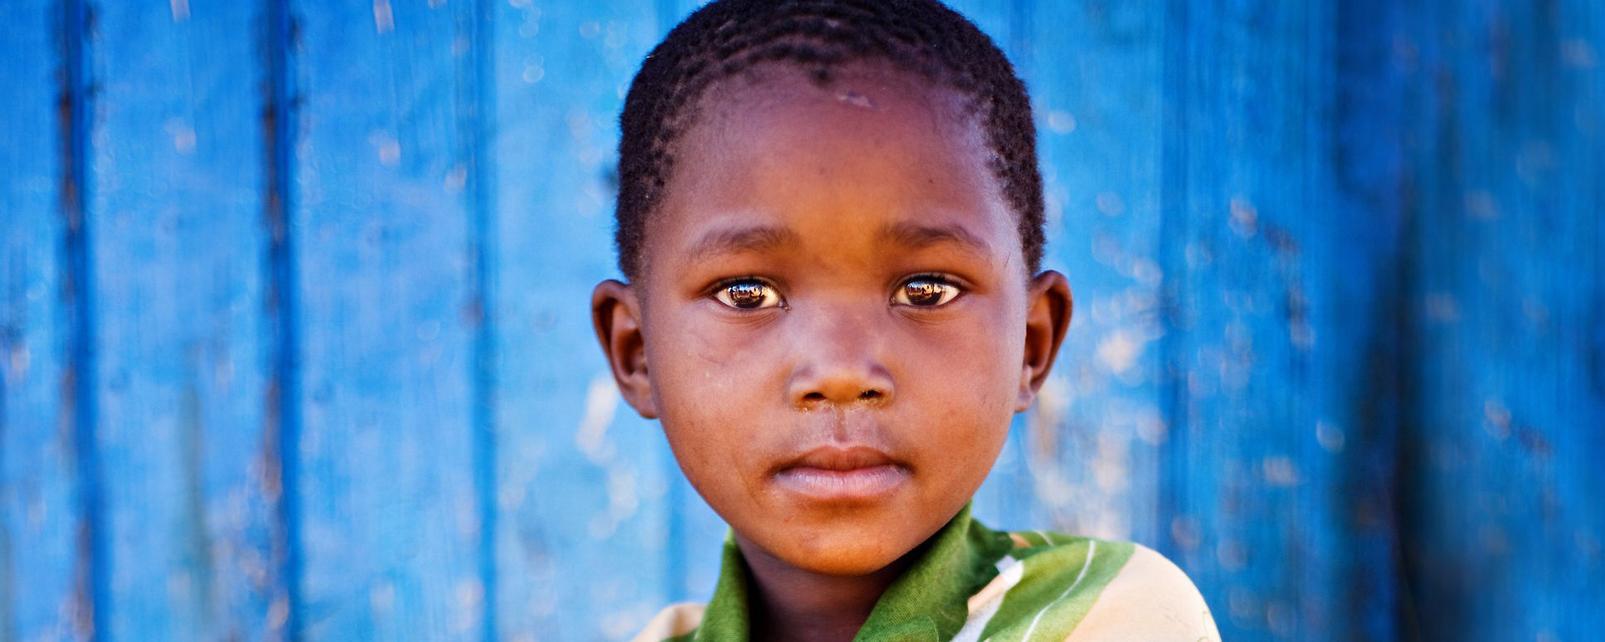 Afrique; Cameroun; Foumban; camerounais; enfant; garçon;